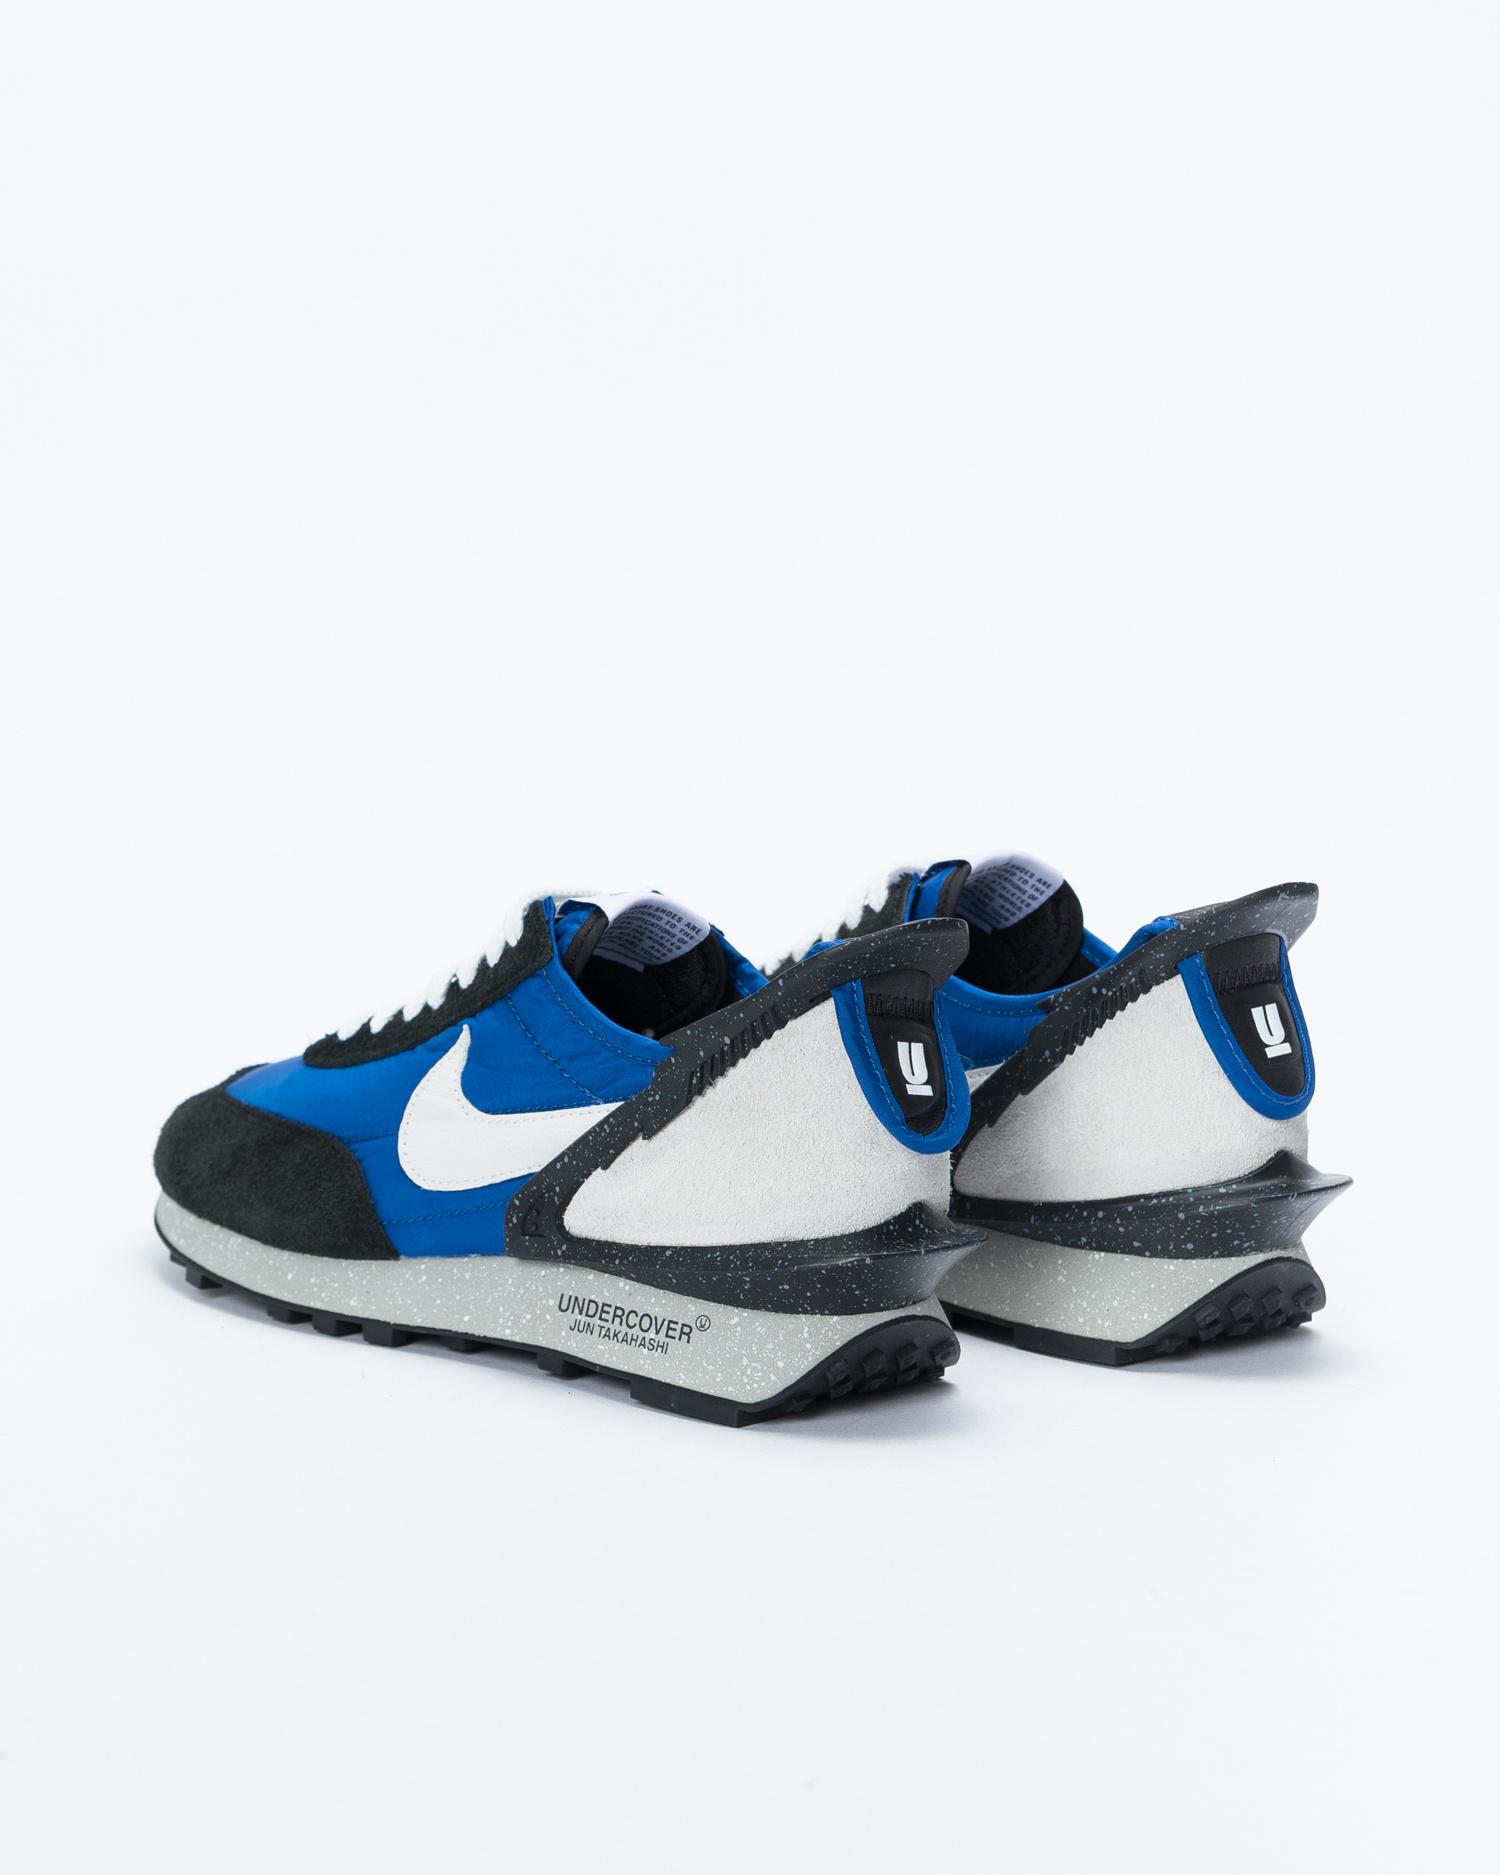 Nike X UNDERCOVER Daybreak Blue Jay/Summit White-Black